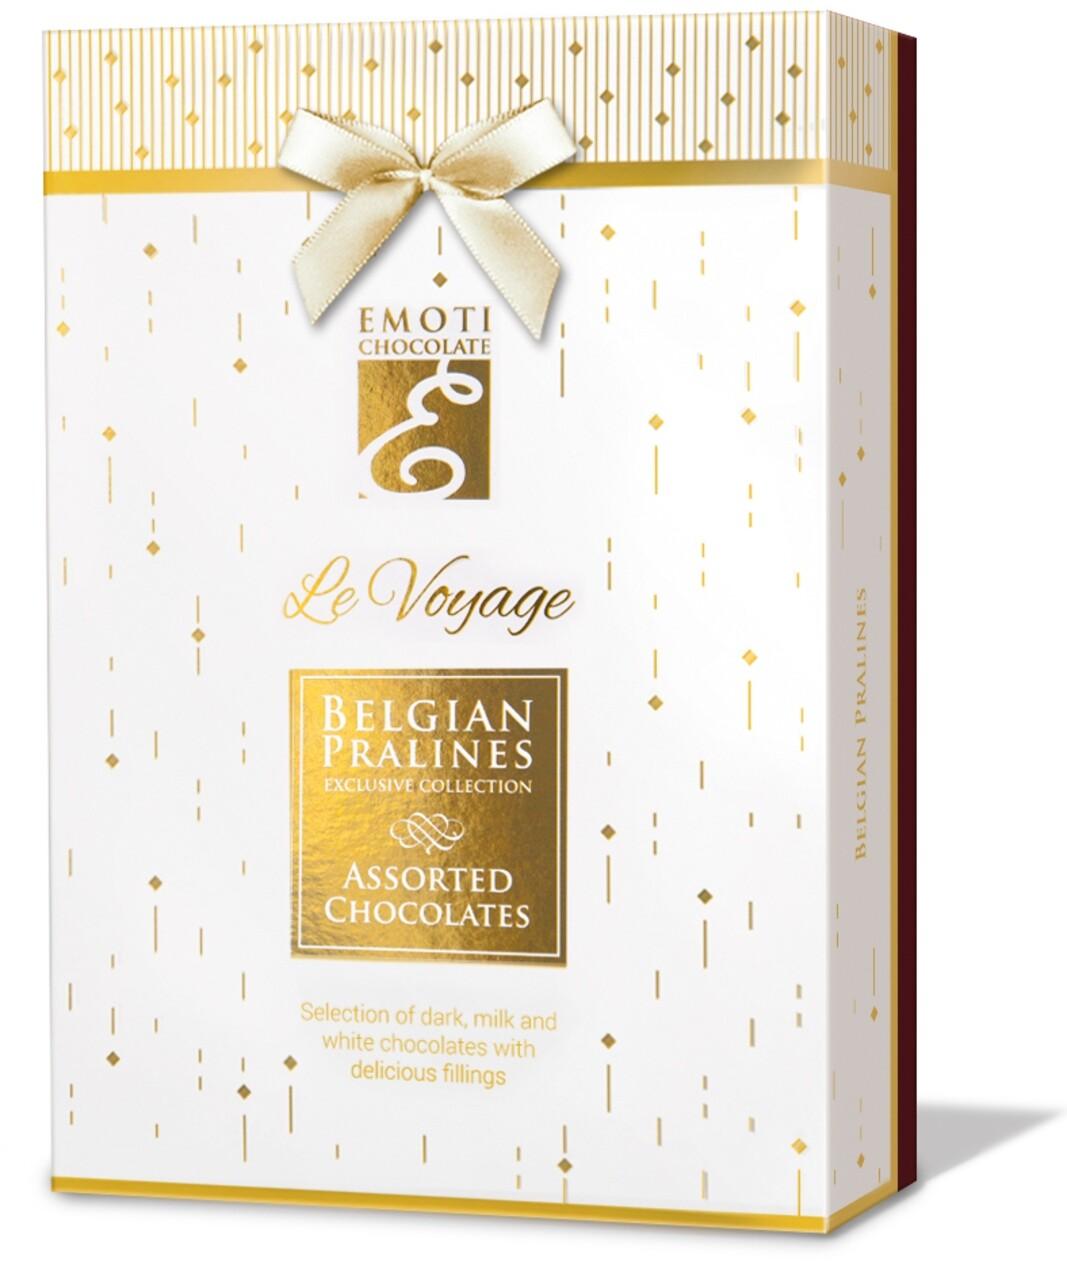 Emoti Le Voyage (Assorted Chocolates) cu Funda 120g